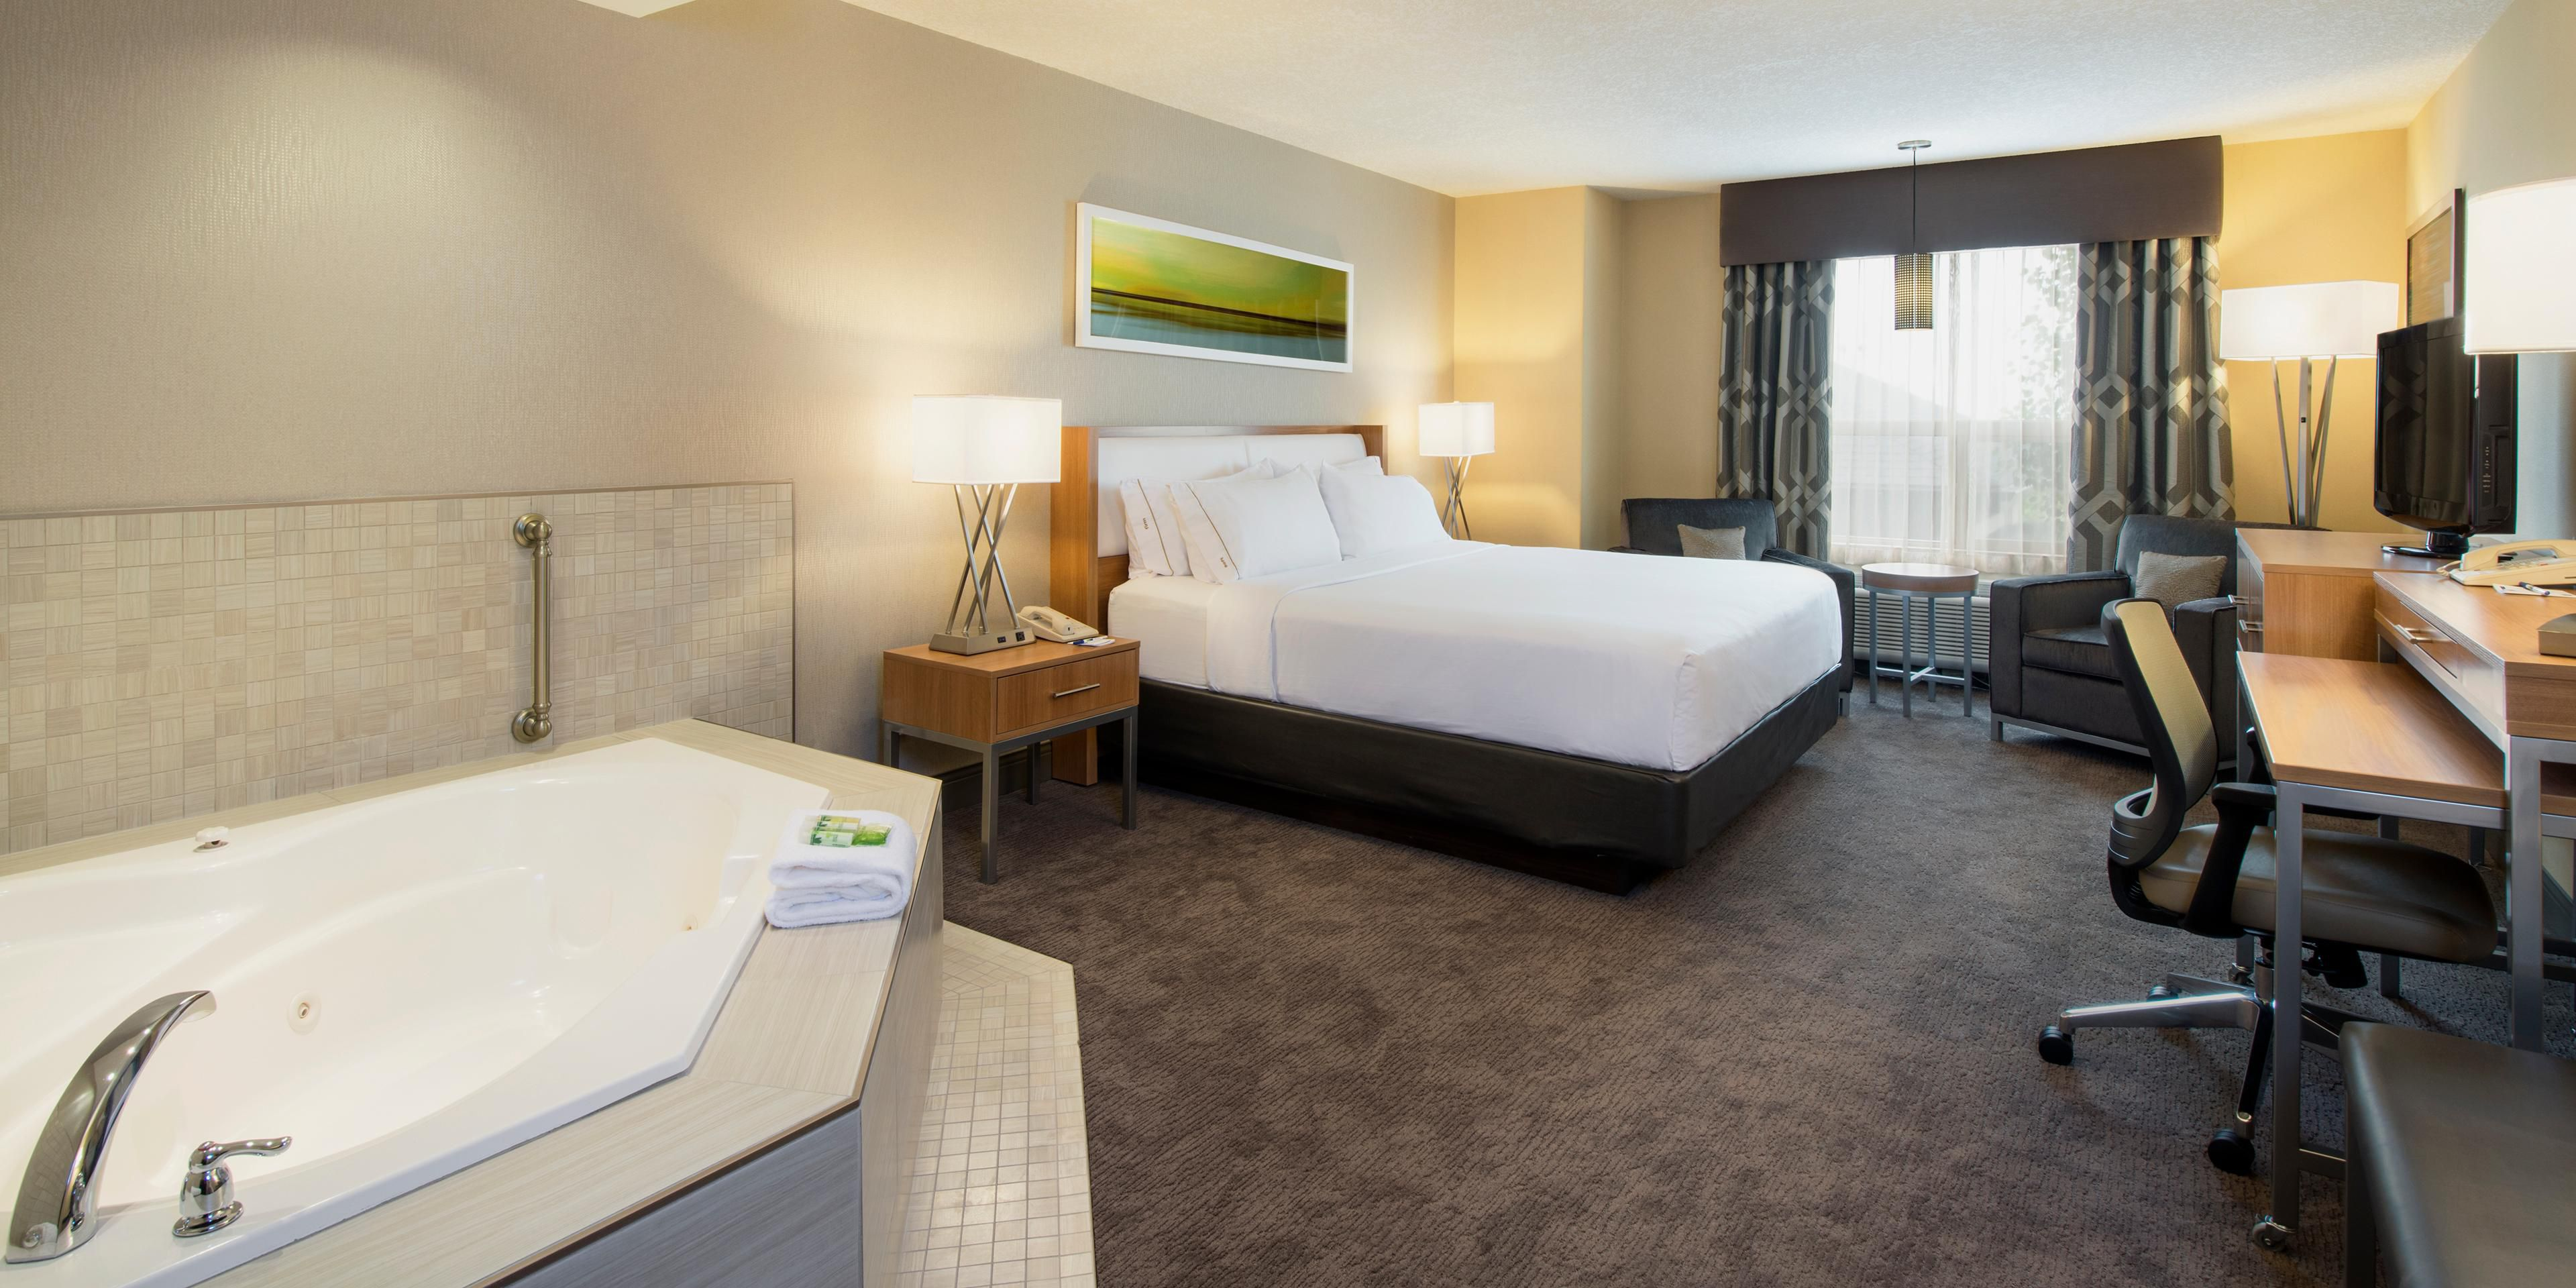 Holiday Inn Express Suites Sherwood Park Edmonton Area Hotel By Ihg